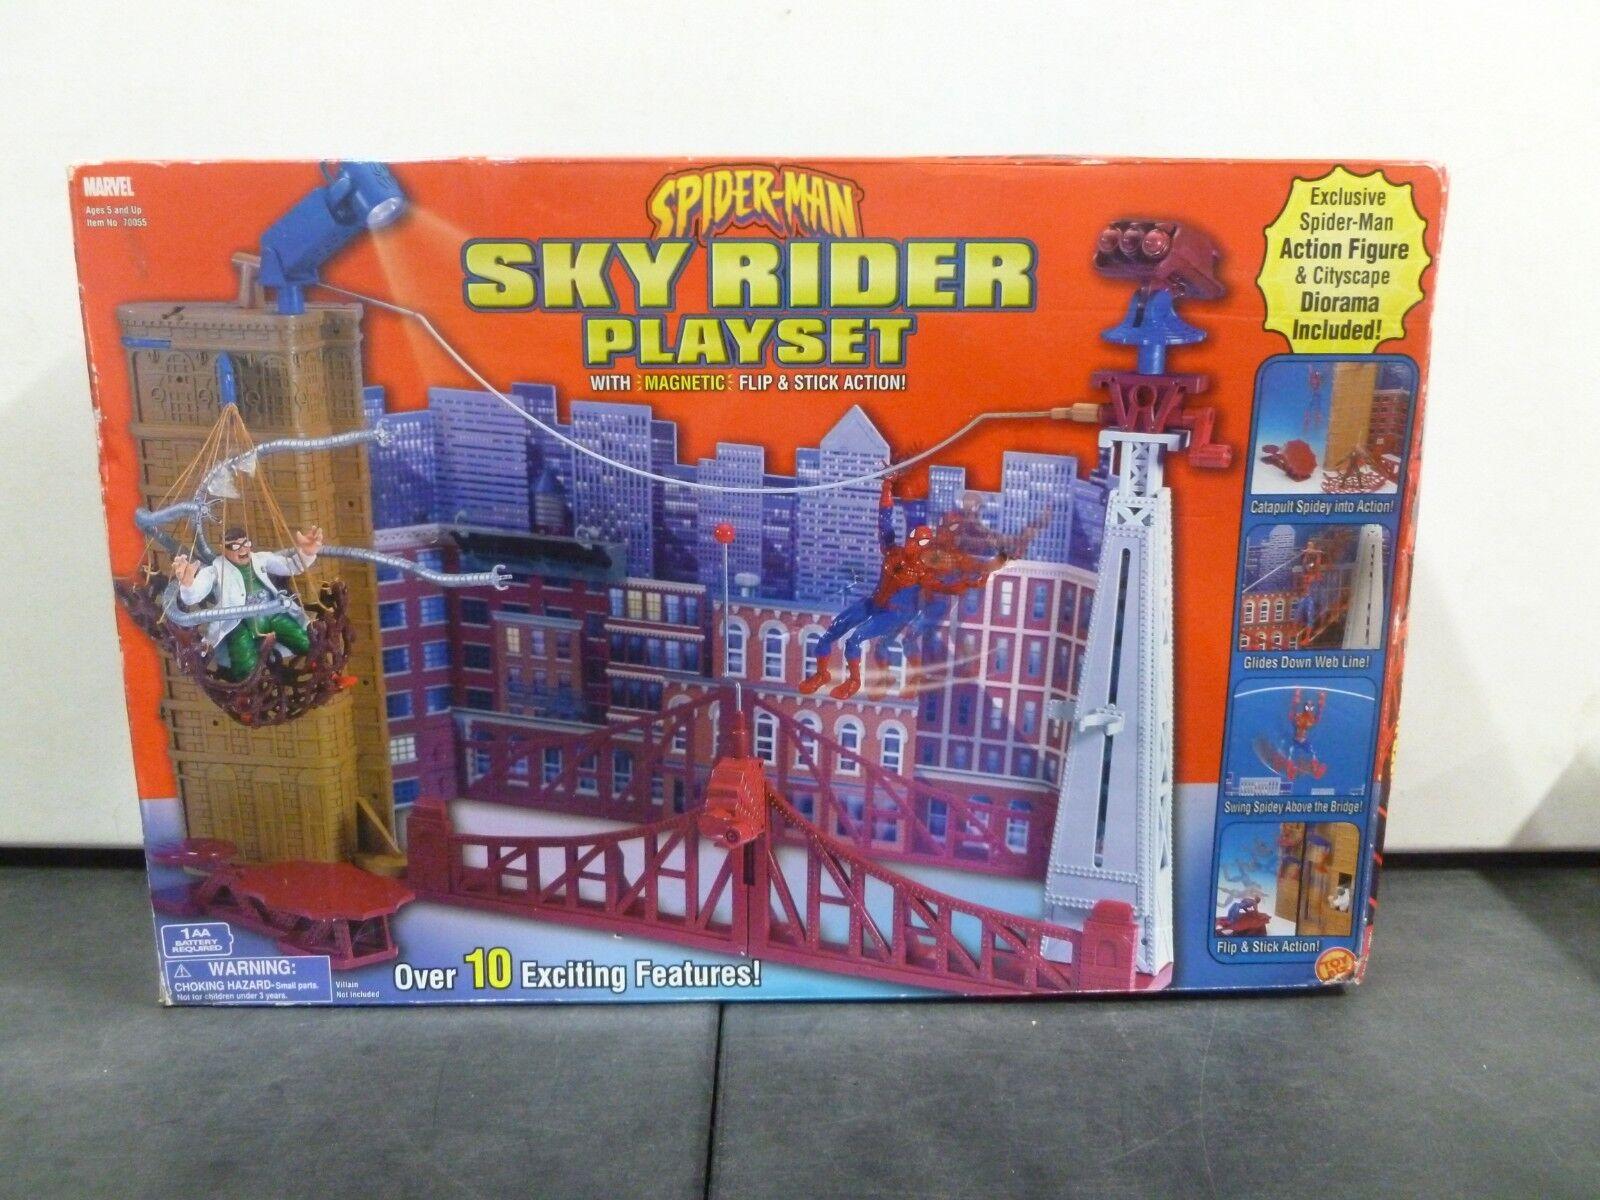 2002 Toy Biz Spiderman Sky Rider Playset